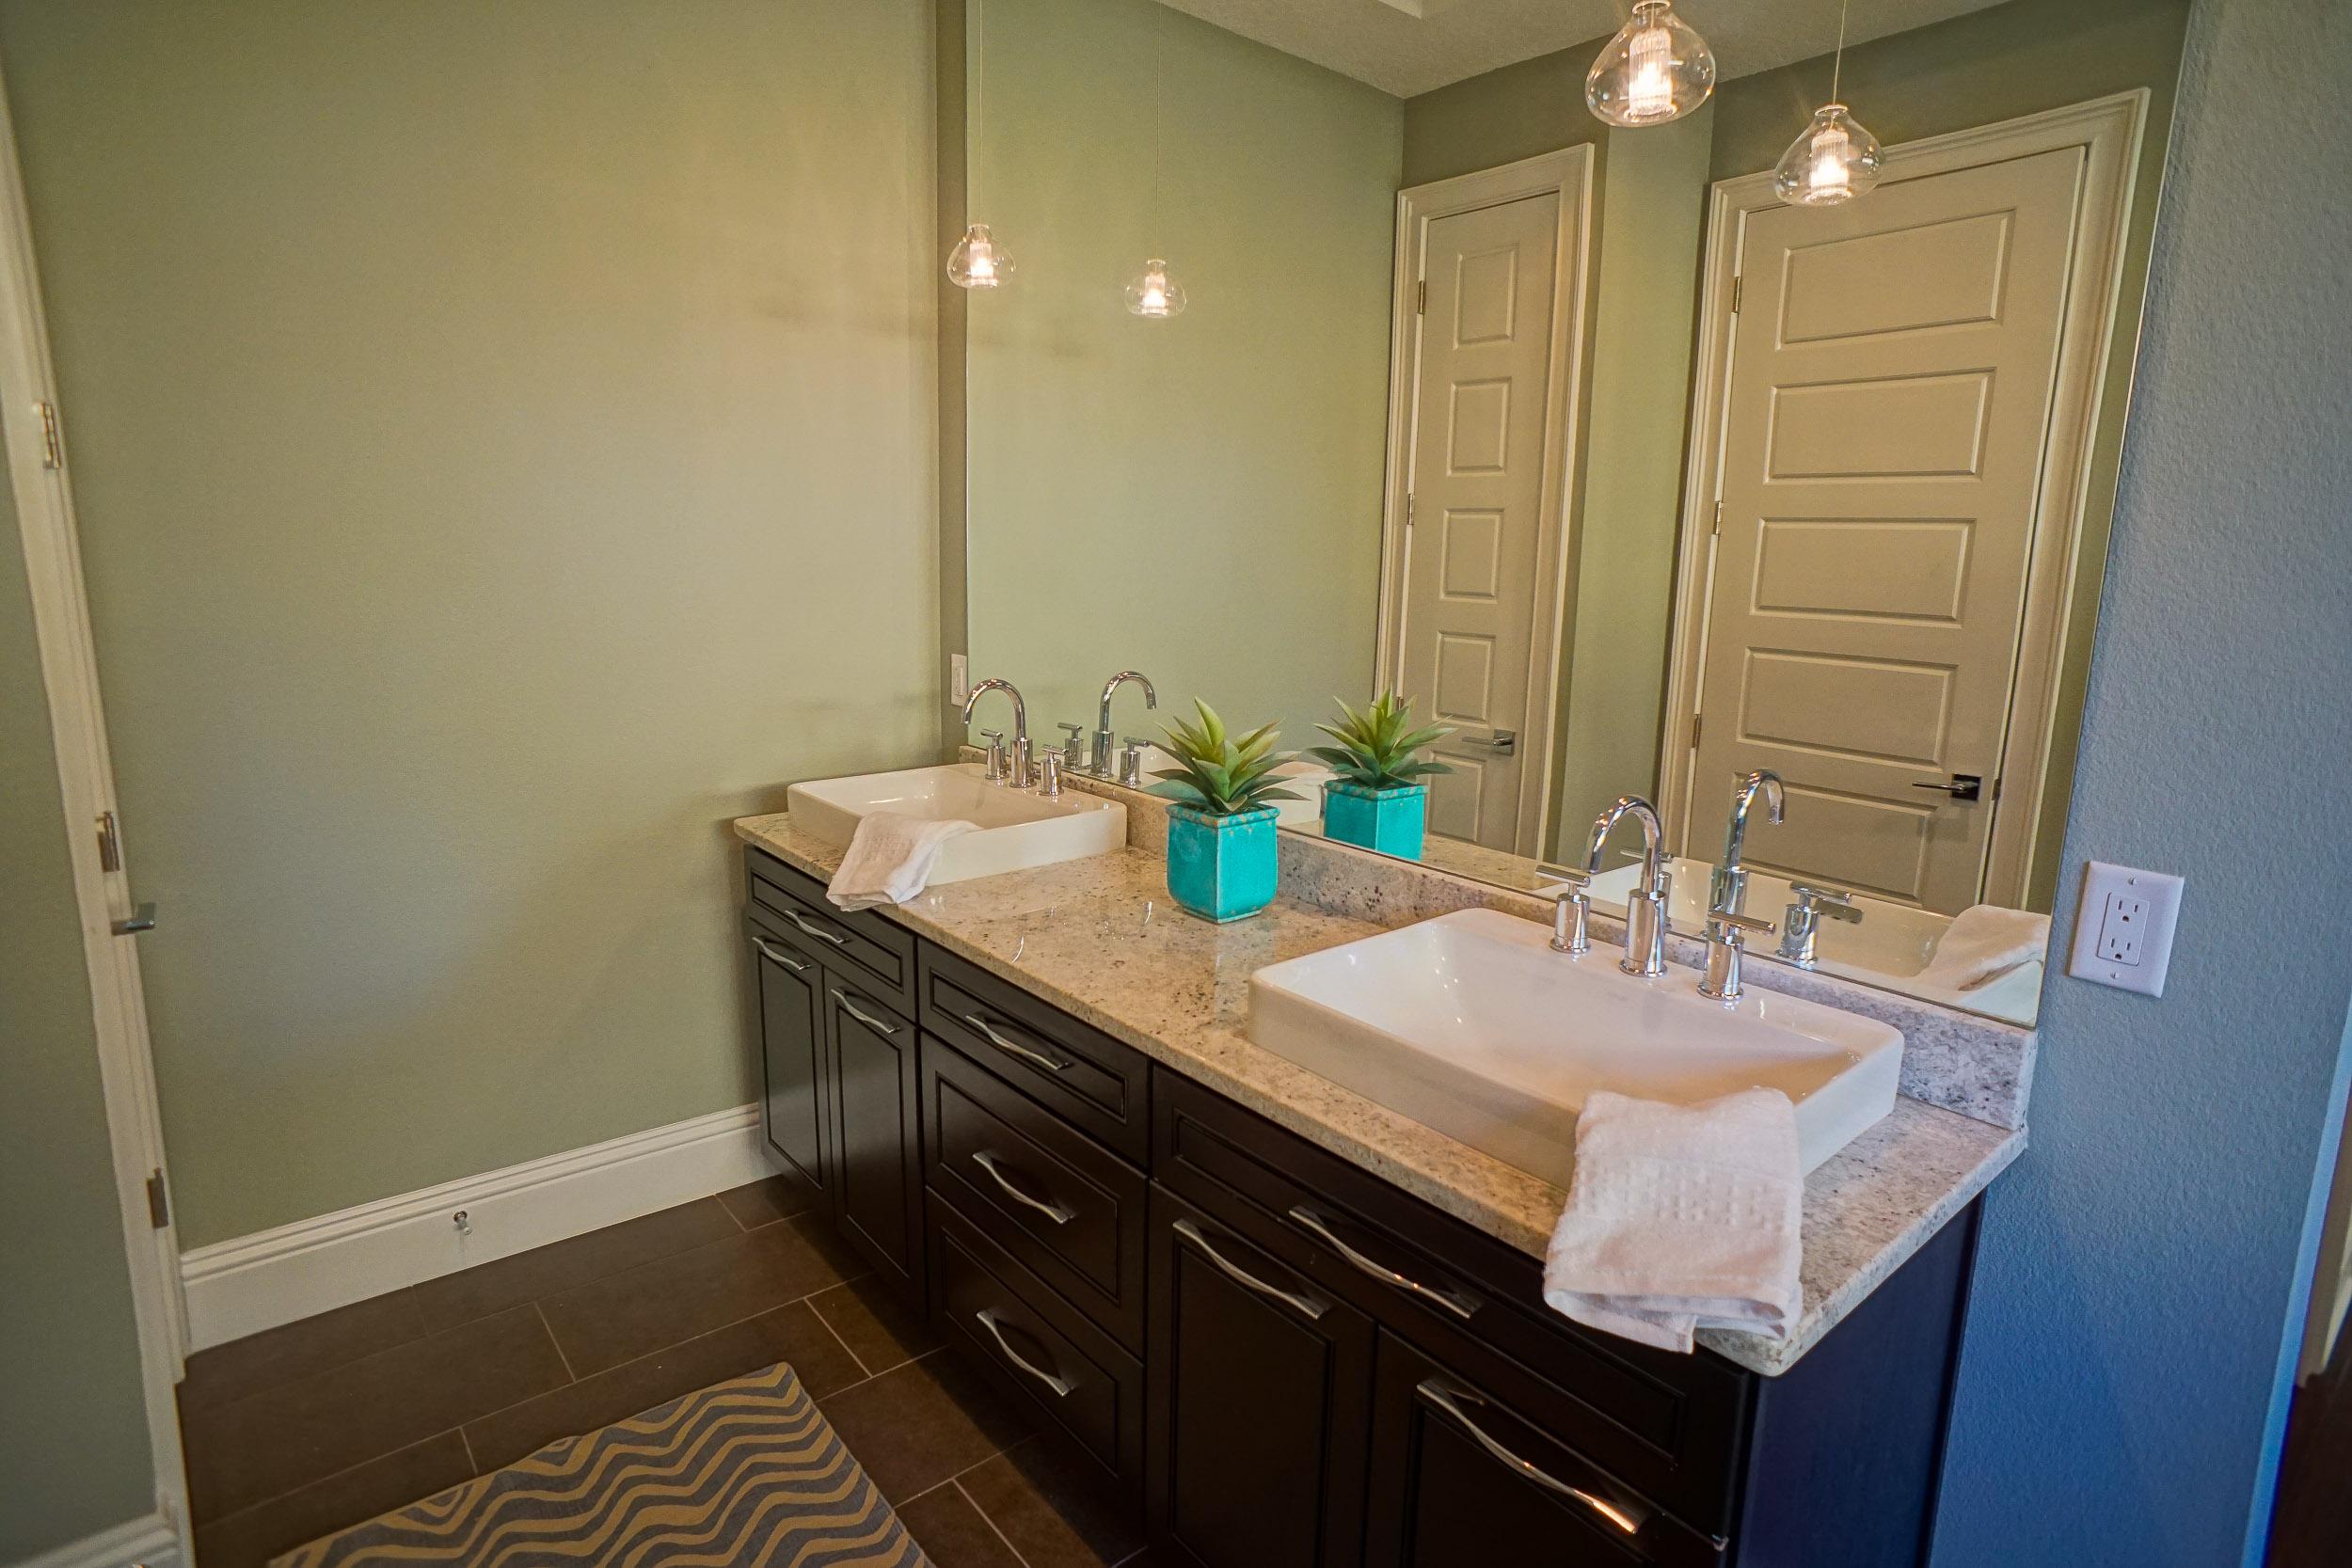 Warehouse Bathroom Vanities Fort Lauderdale Bathroom Vanities Custom Bathroom  Vanities Fort. Warehouse Bathroom Vanities Fort Lauderdale   Bathroom  Vanities ...